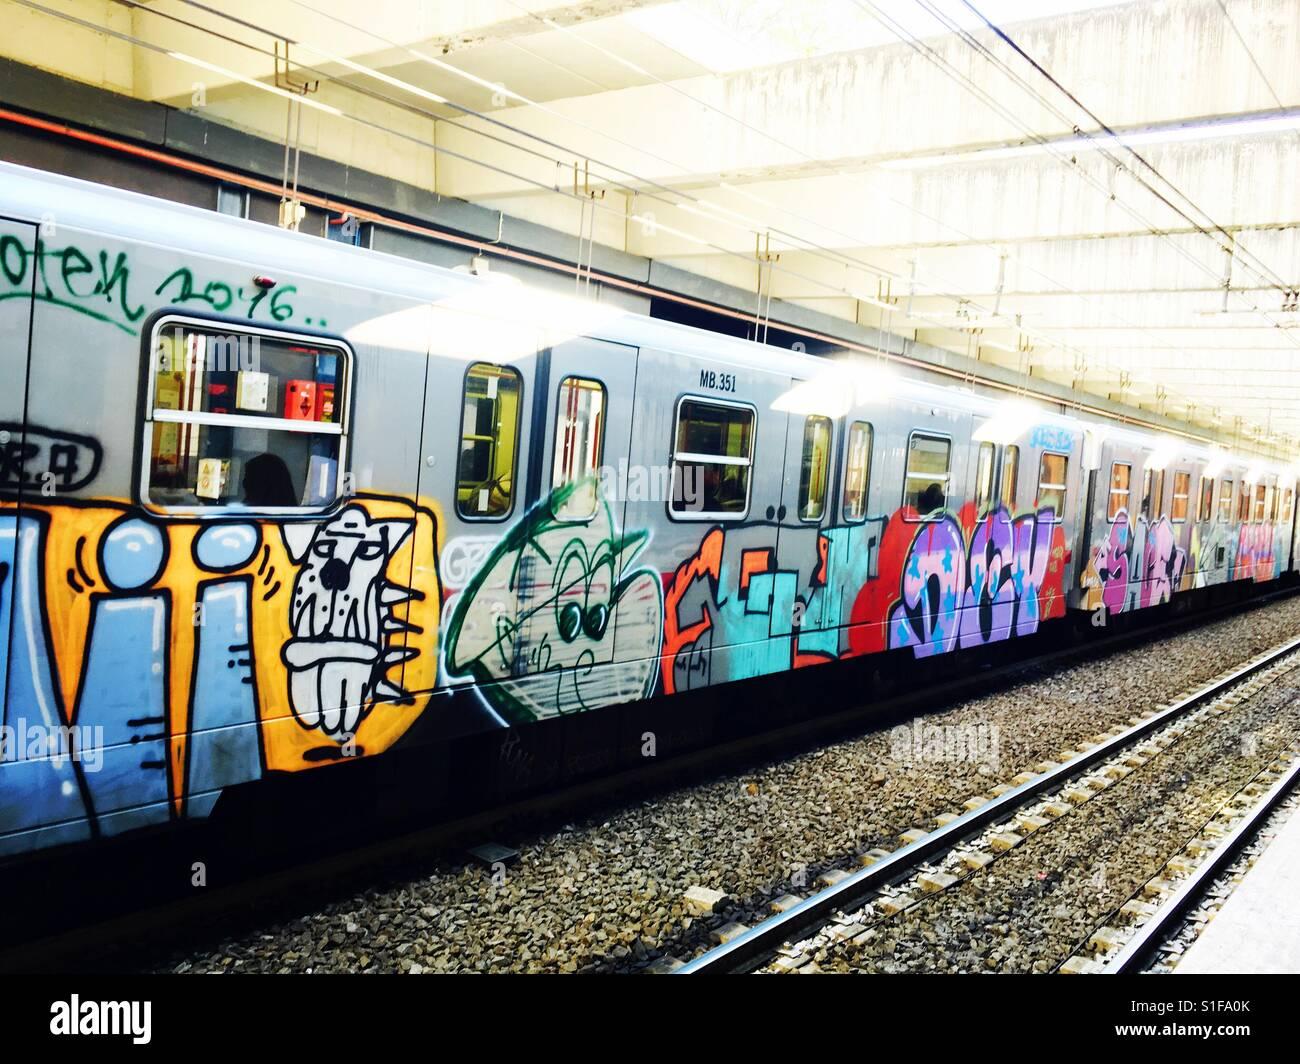 Graffiti work on trains stock image